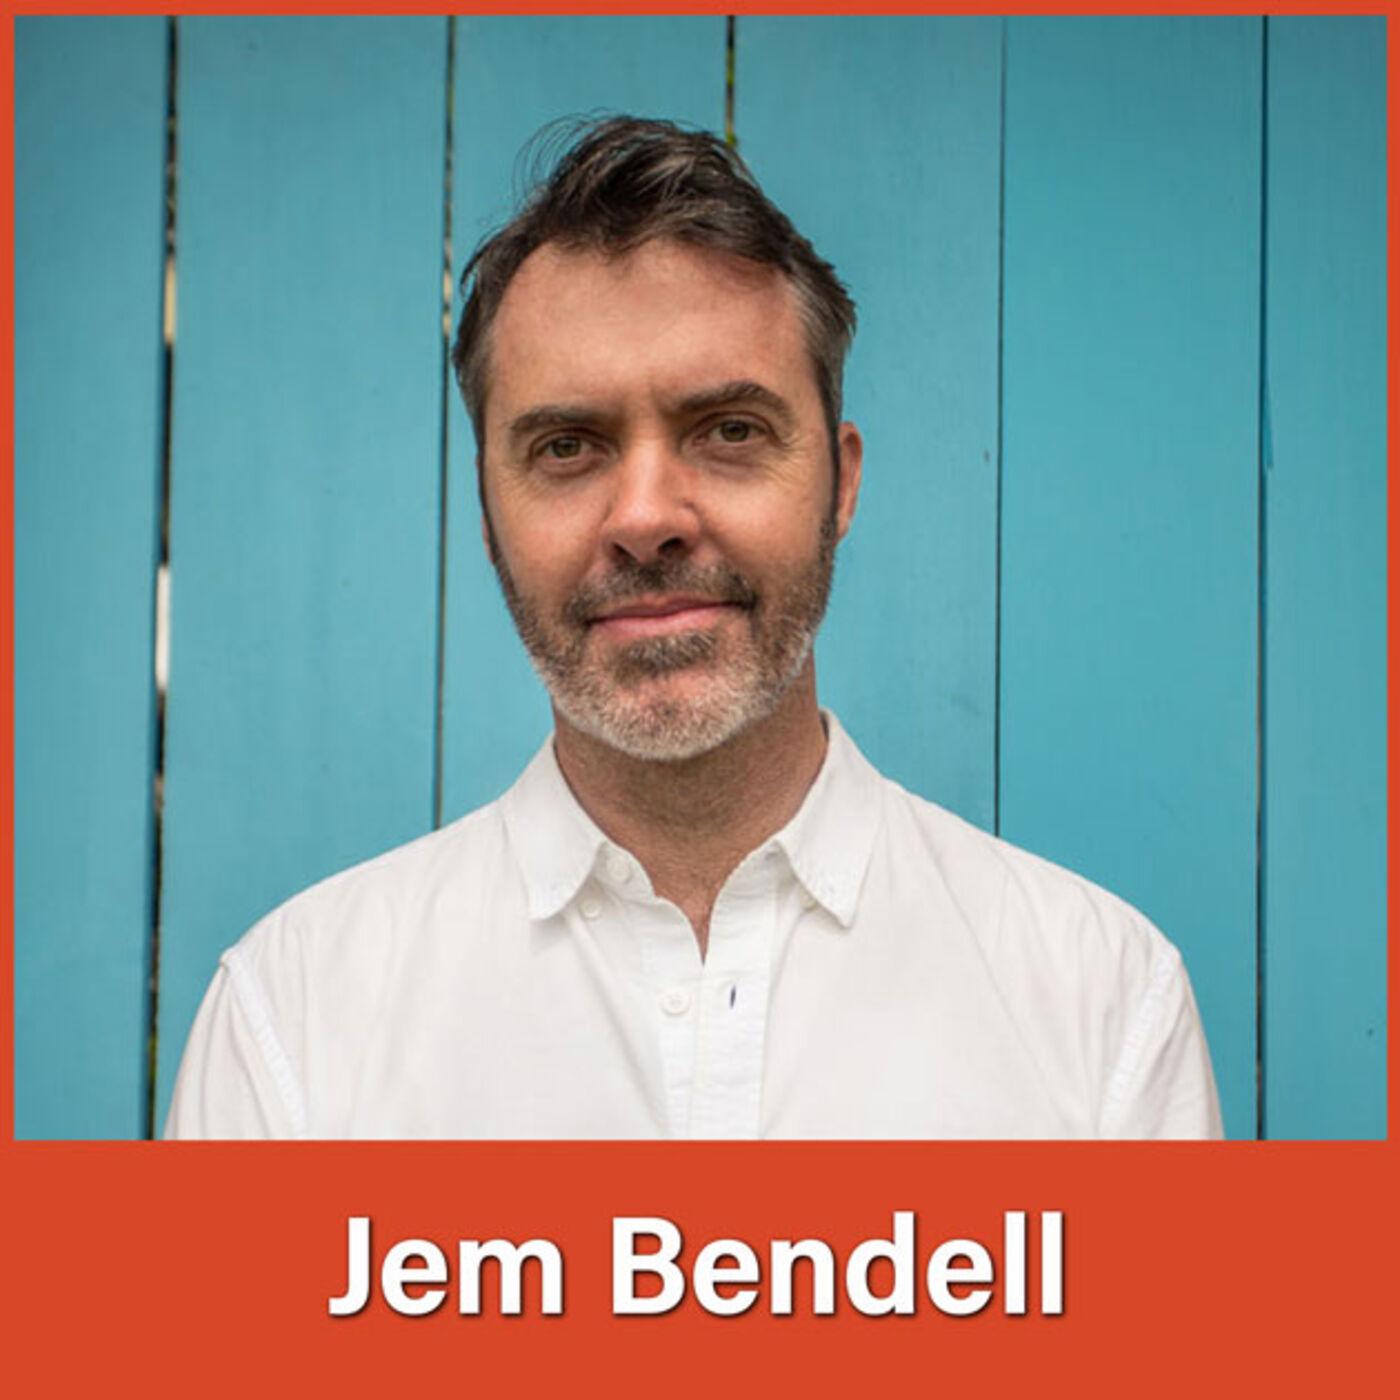 #33 Jem Bendell: Cultivating a New Ethos